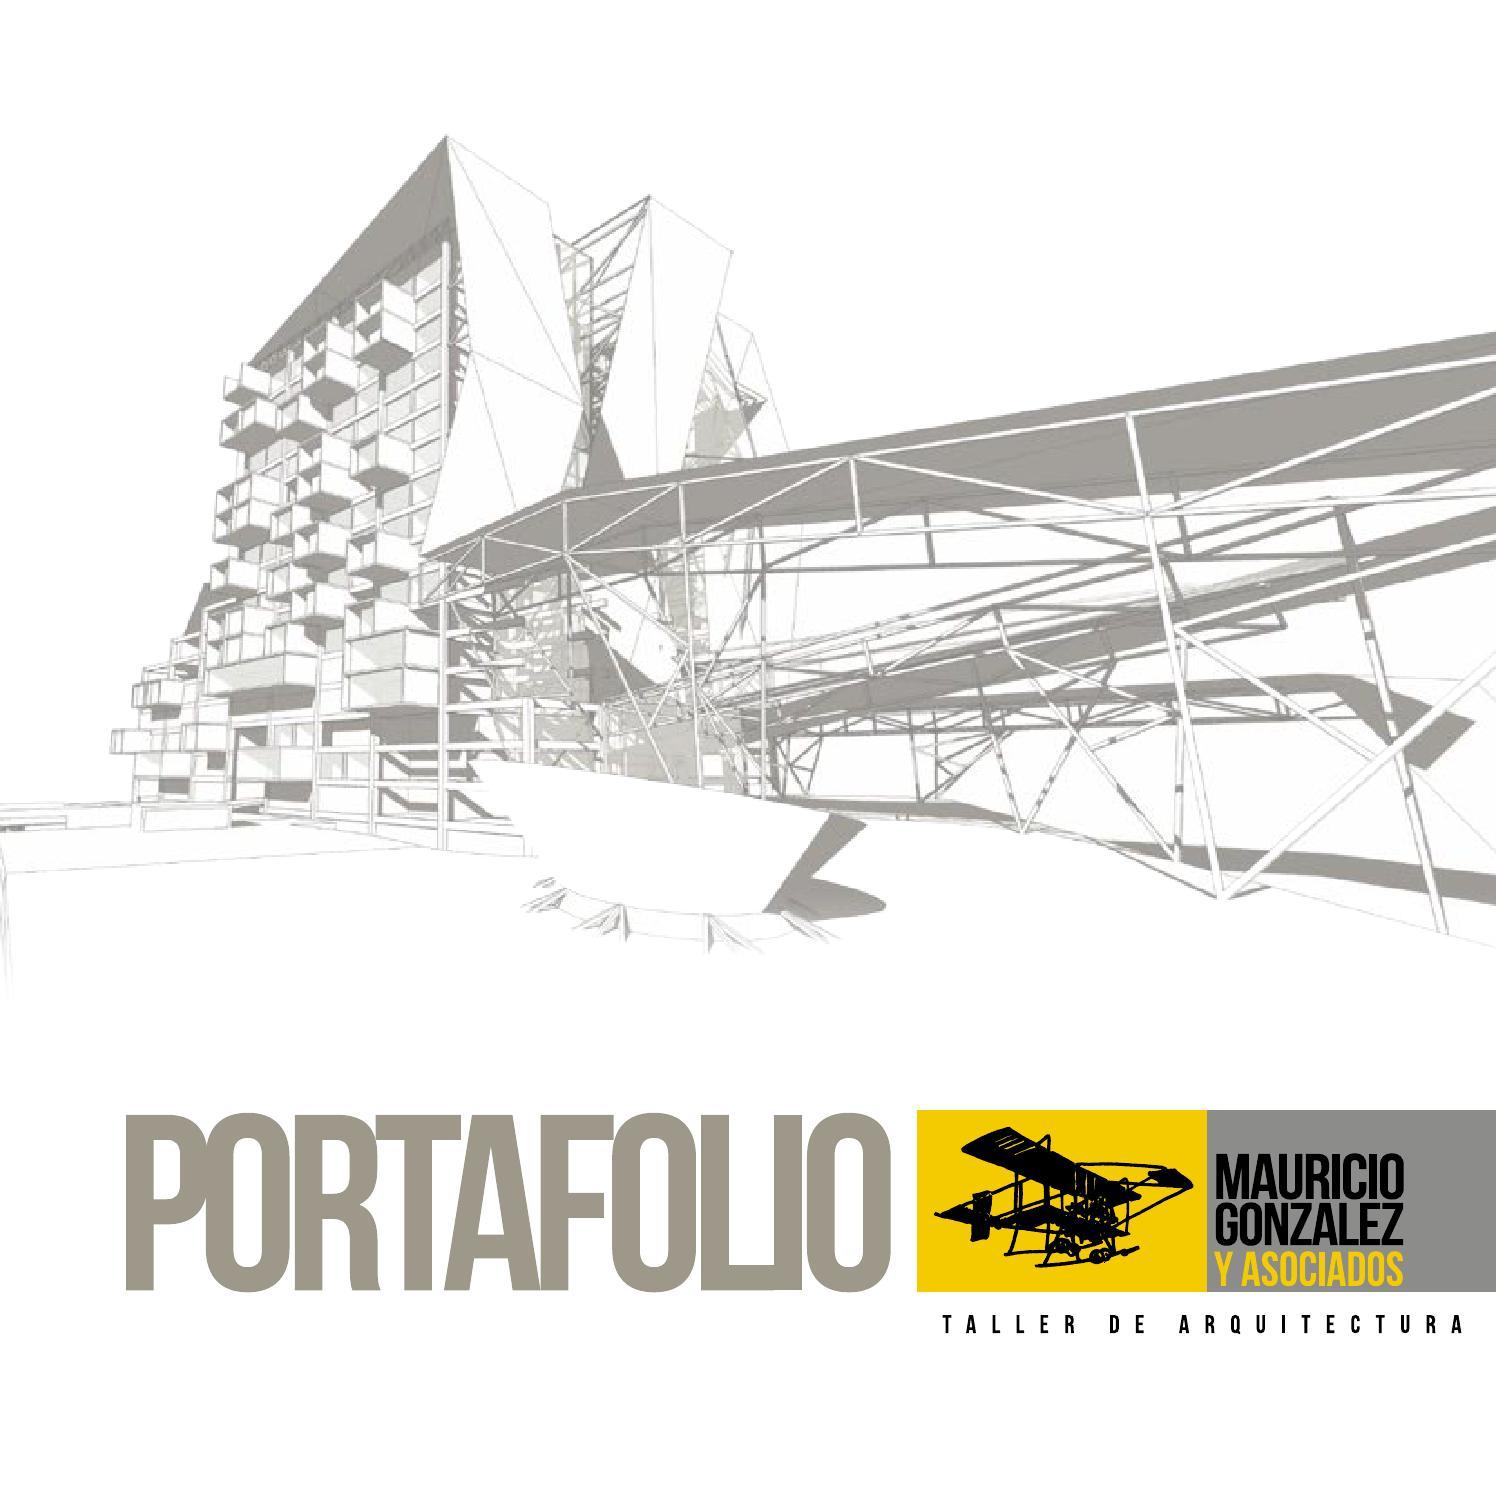 Portafolio mauricio gonzalez arquitectura by gabriel for Portafolio arquitectura